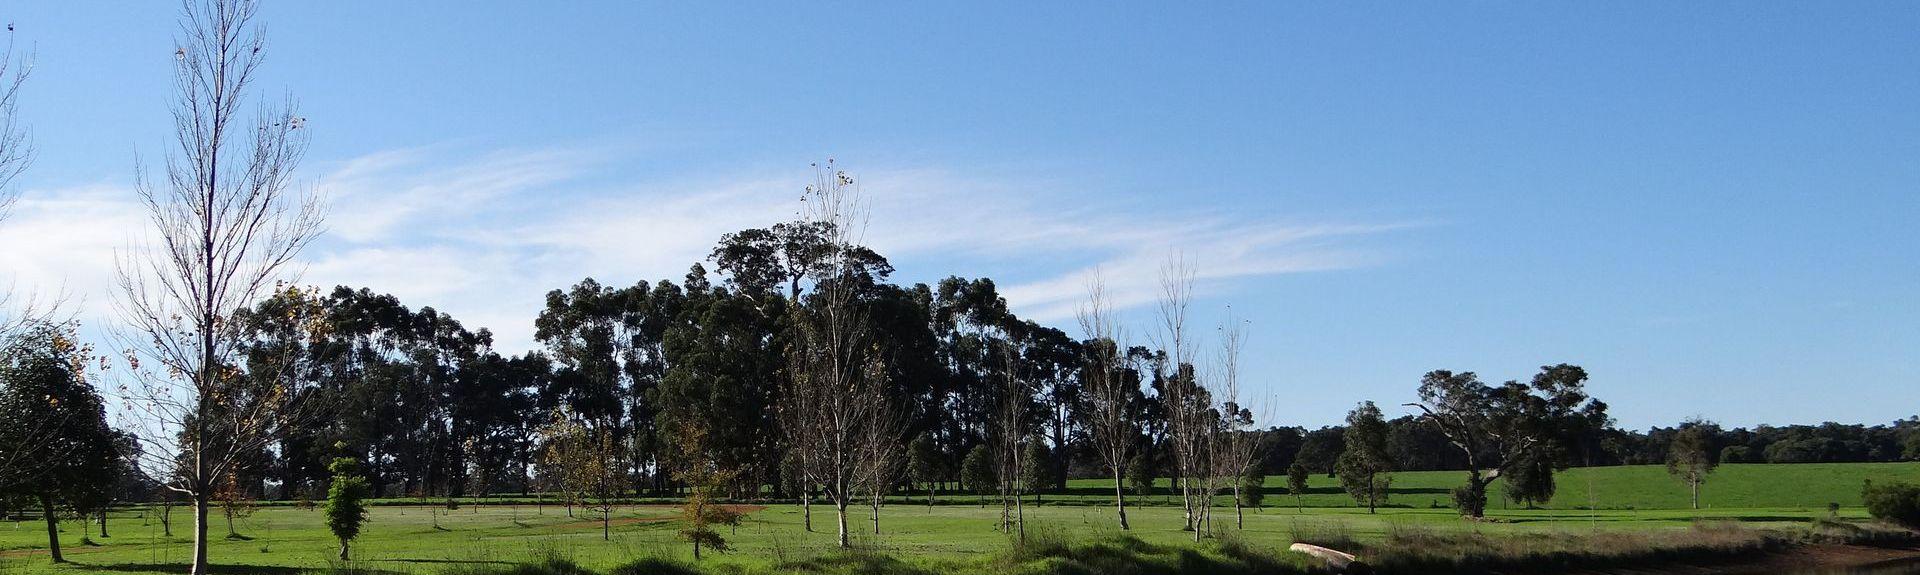 Yallingup Siding, Busselton, Western Australia, Australia